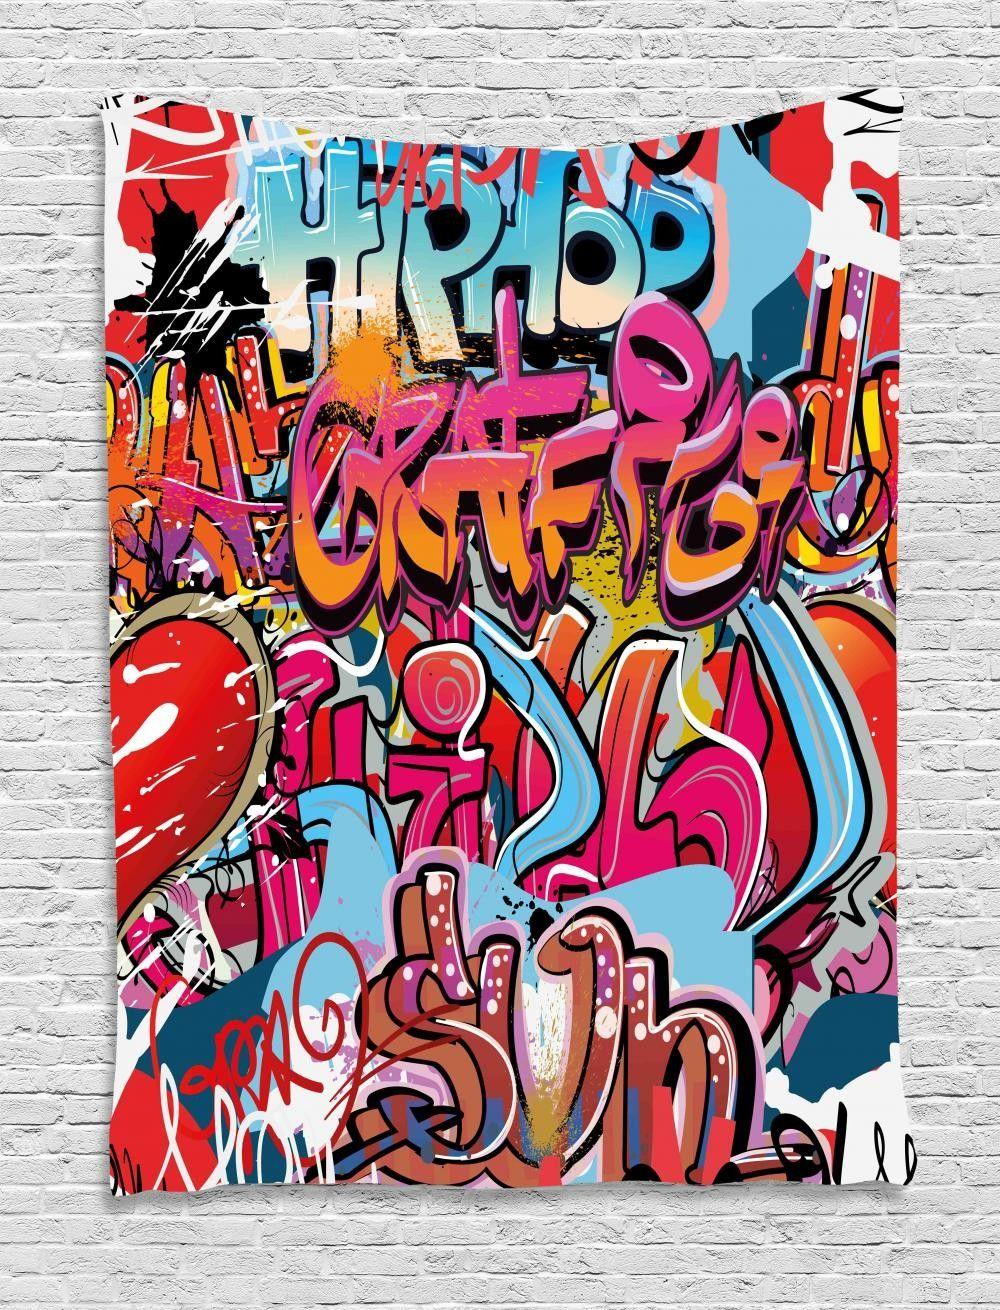 Graffiti words graffiti styles graffiti lettering street art graffiti grafitti letters